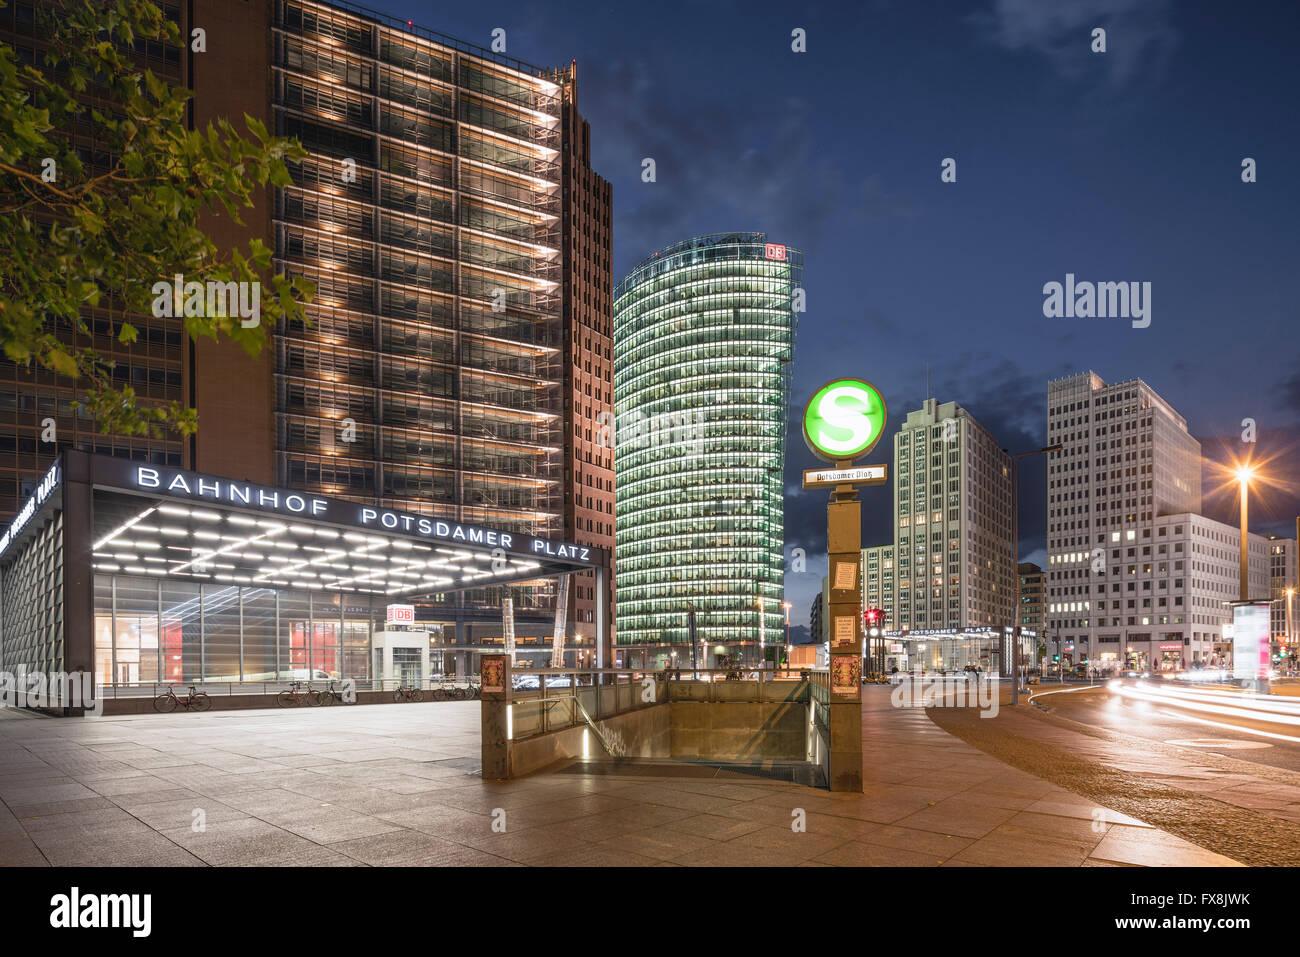 Potsdamer Platz, Berlin,  DB Tower , S Bahn Entrance, Berlin Center, Germany Stock Photo